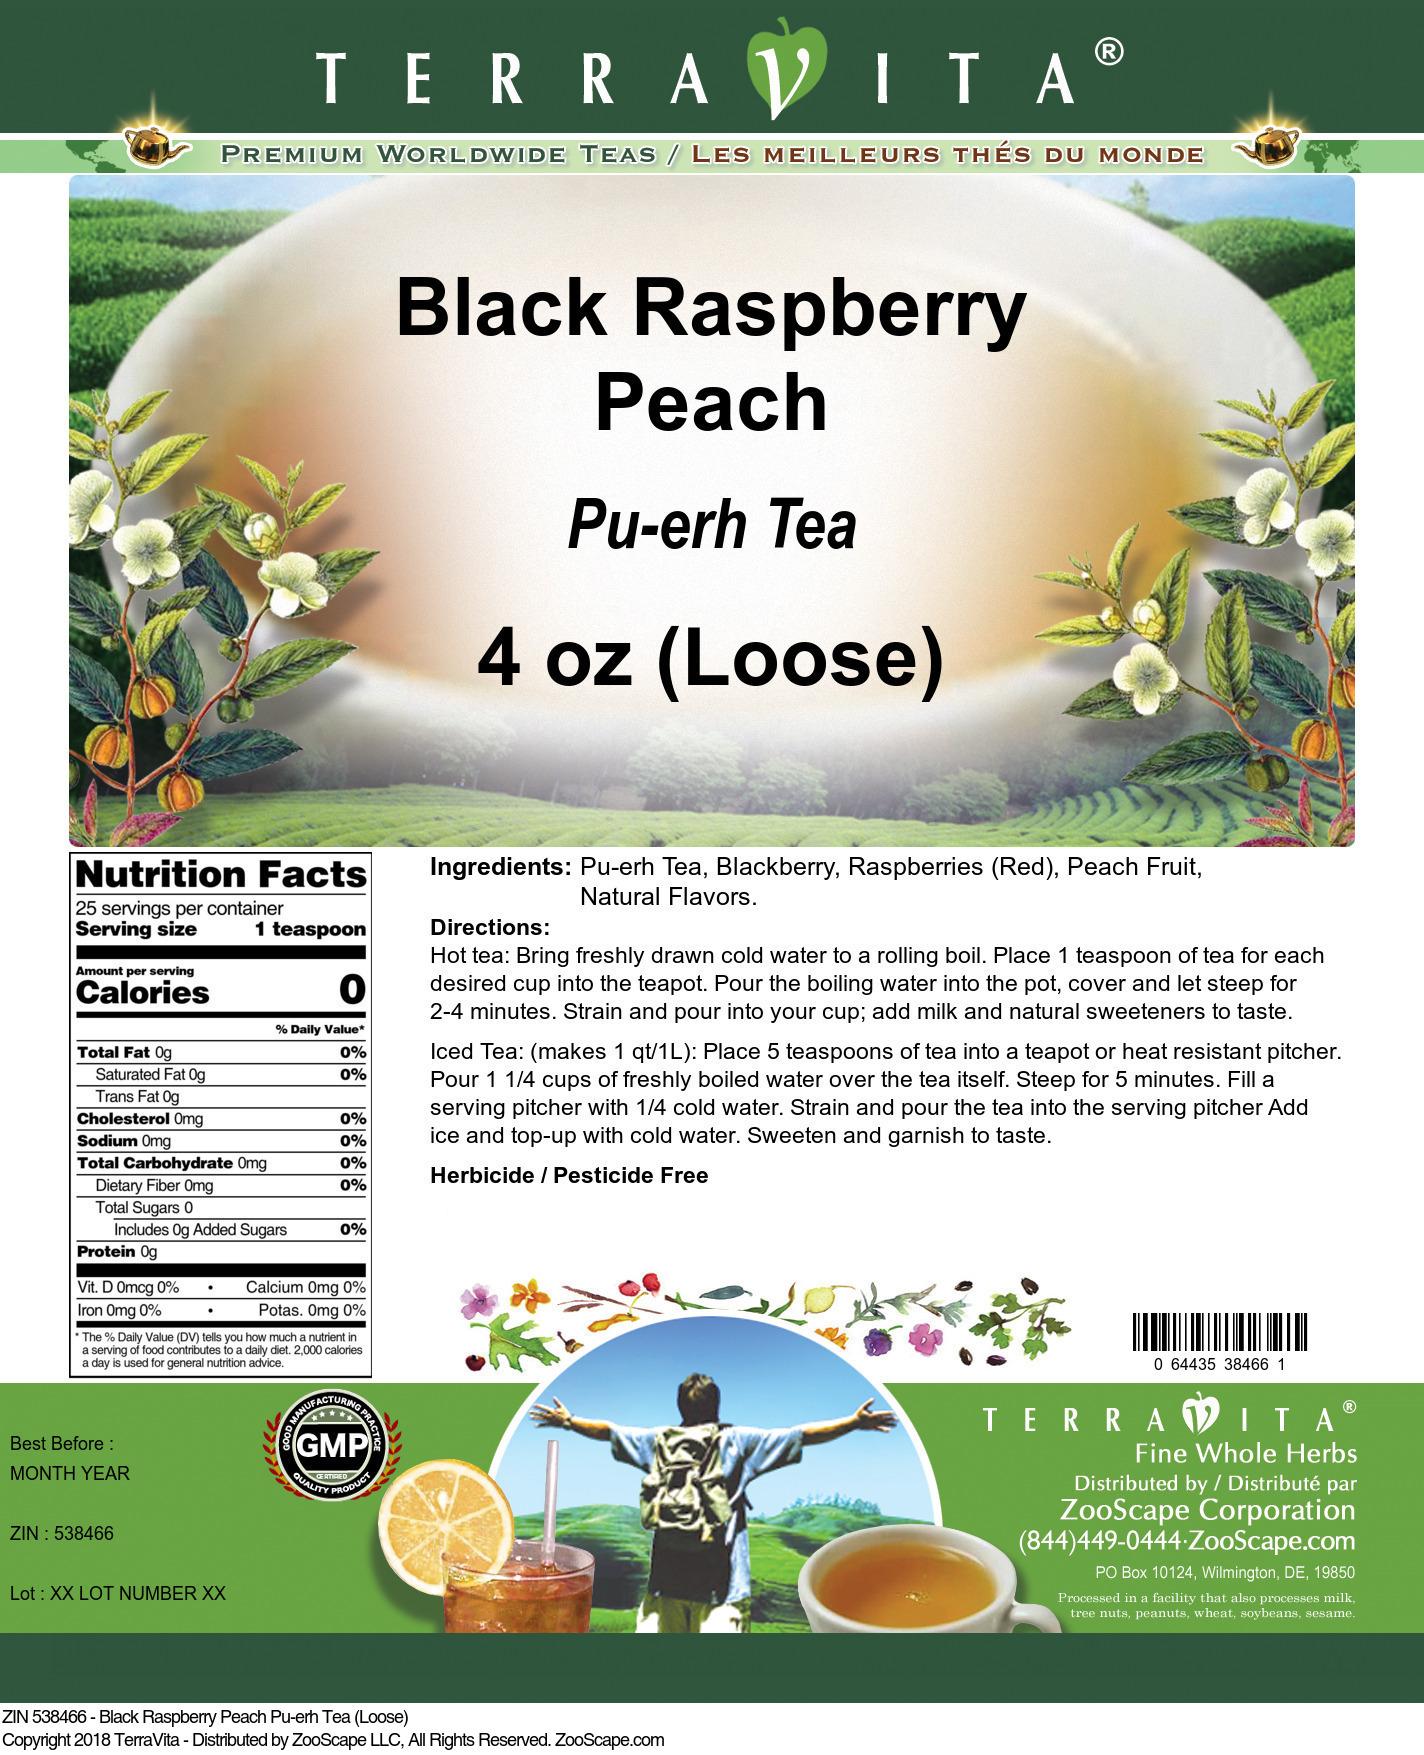 Black Raspberry Peach Pu-erh Tea (Loose)